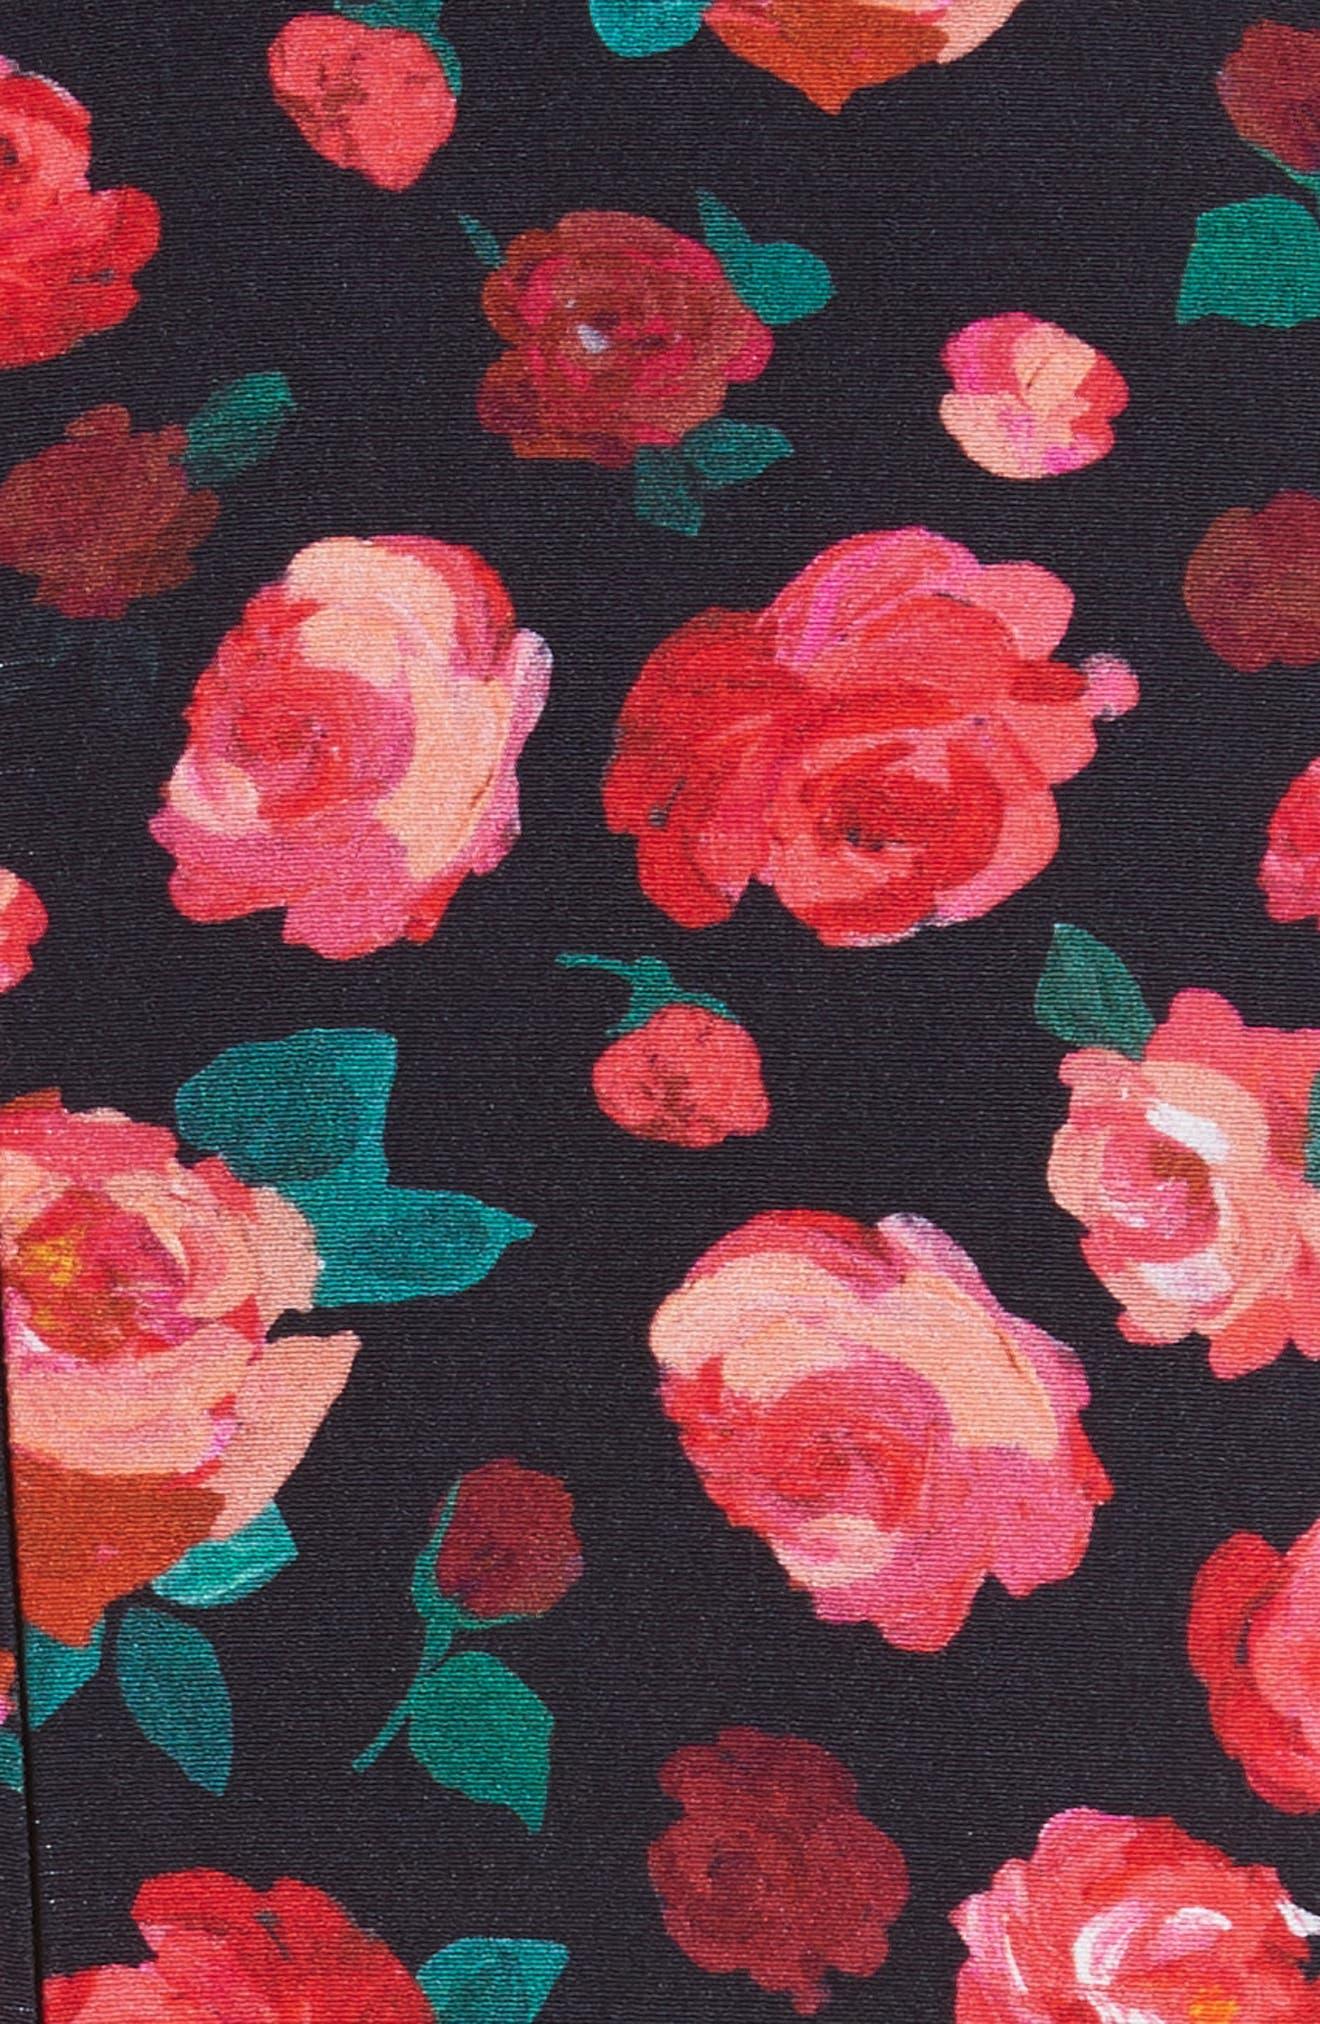 Floral Print Fit & Flare Dress,                             Alternate thumbnail 5, color,                             621